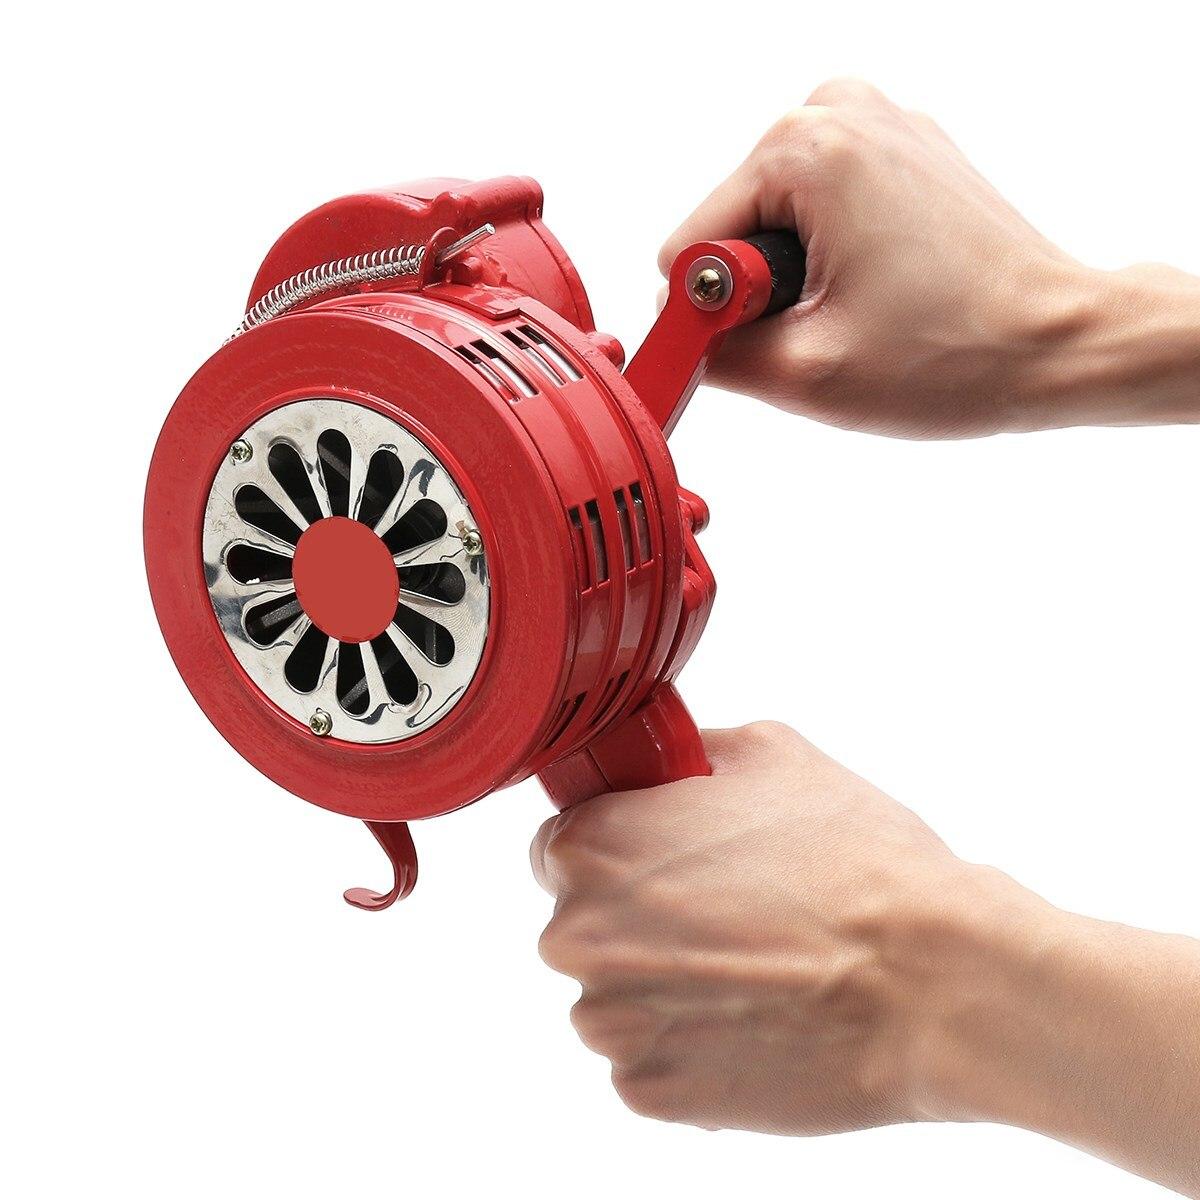 4.5 Inch Red/green All Metal Handheld Manual Operation Safety Alarm Air Raid Siren Portable Flood Warning Signal Warning Tool